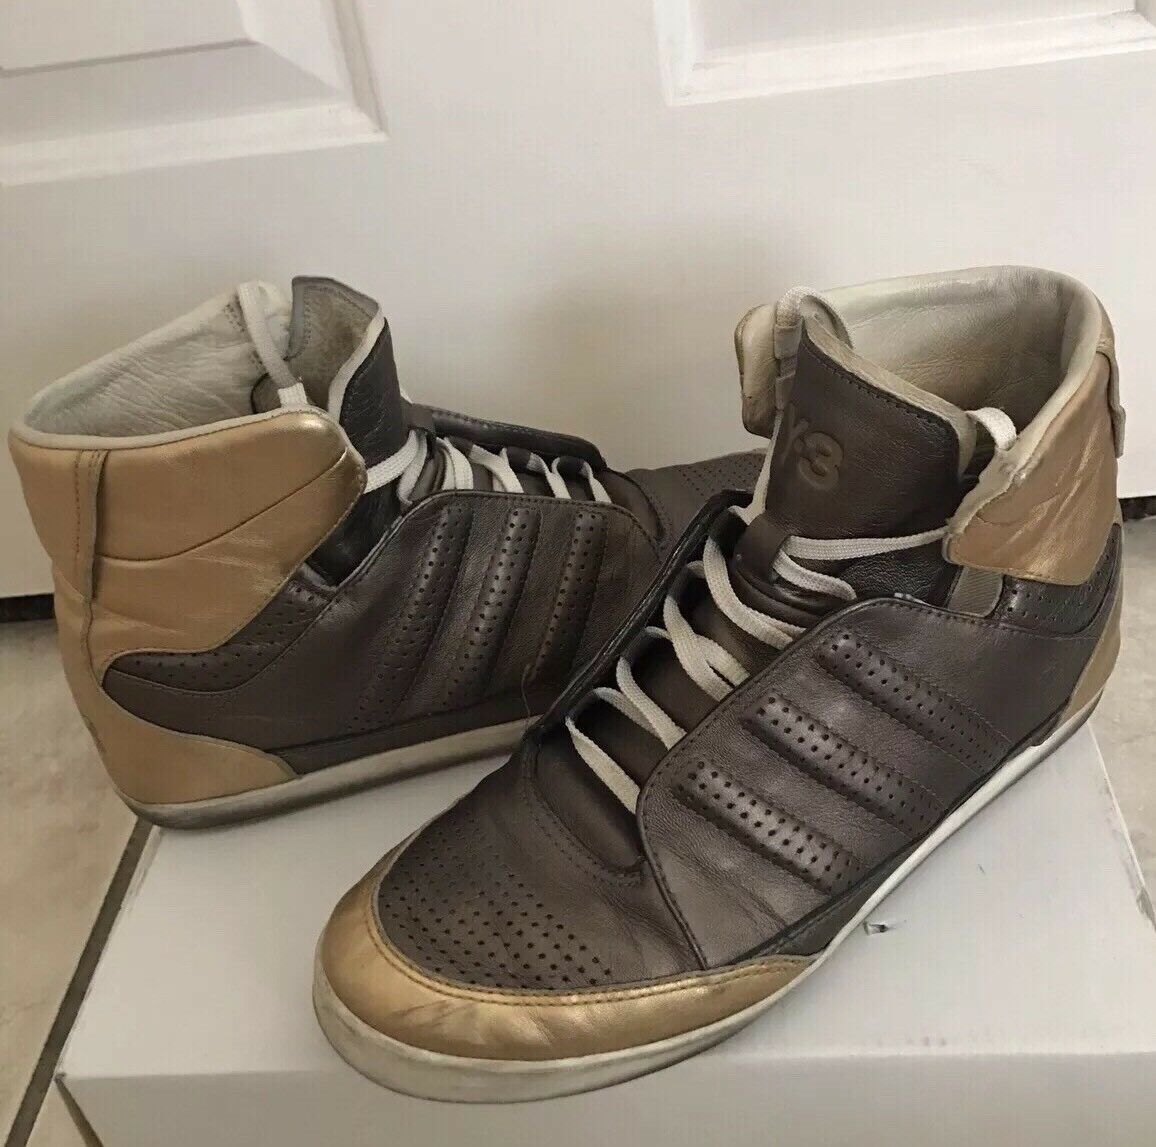 Y-3 Adidas Shoes Yohji Yamamoto Metallic Pelle Lace Up High Top   7.5